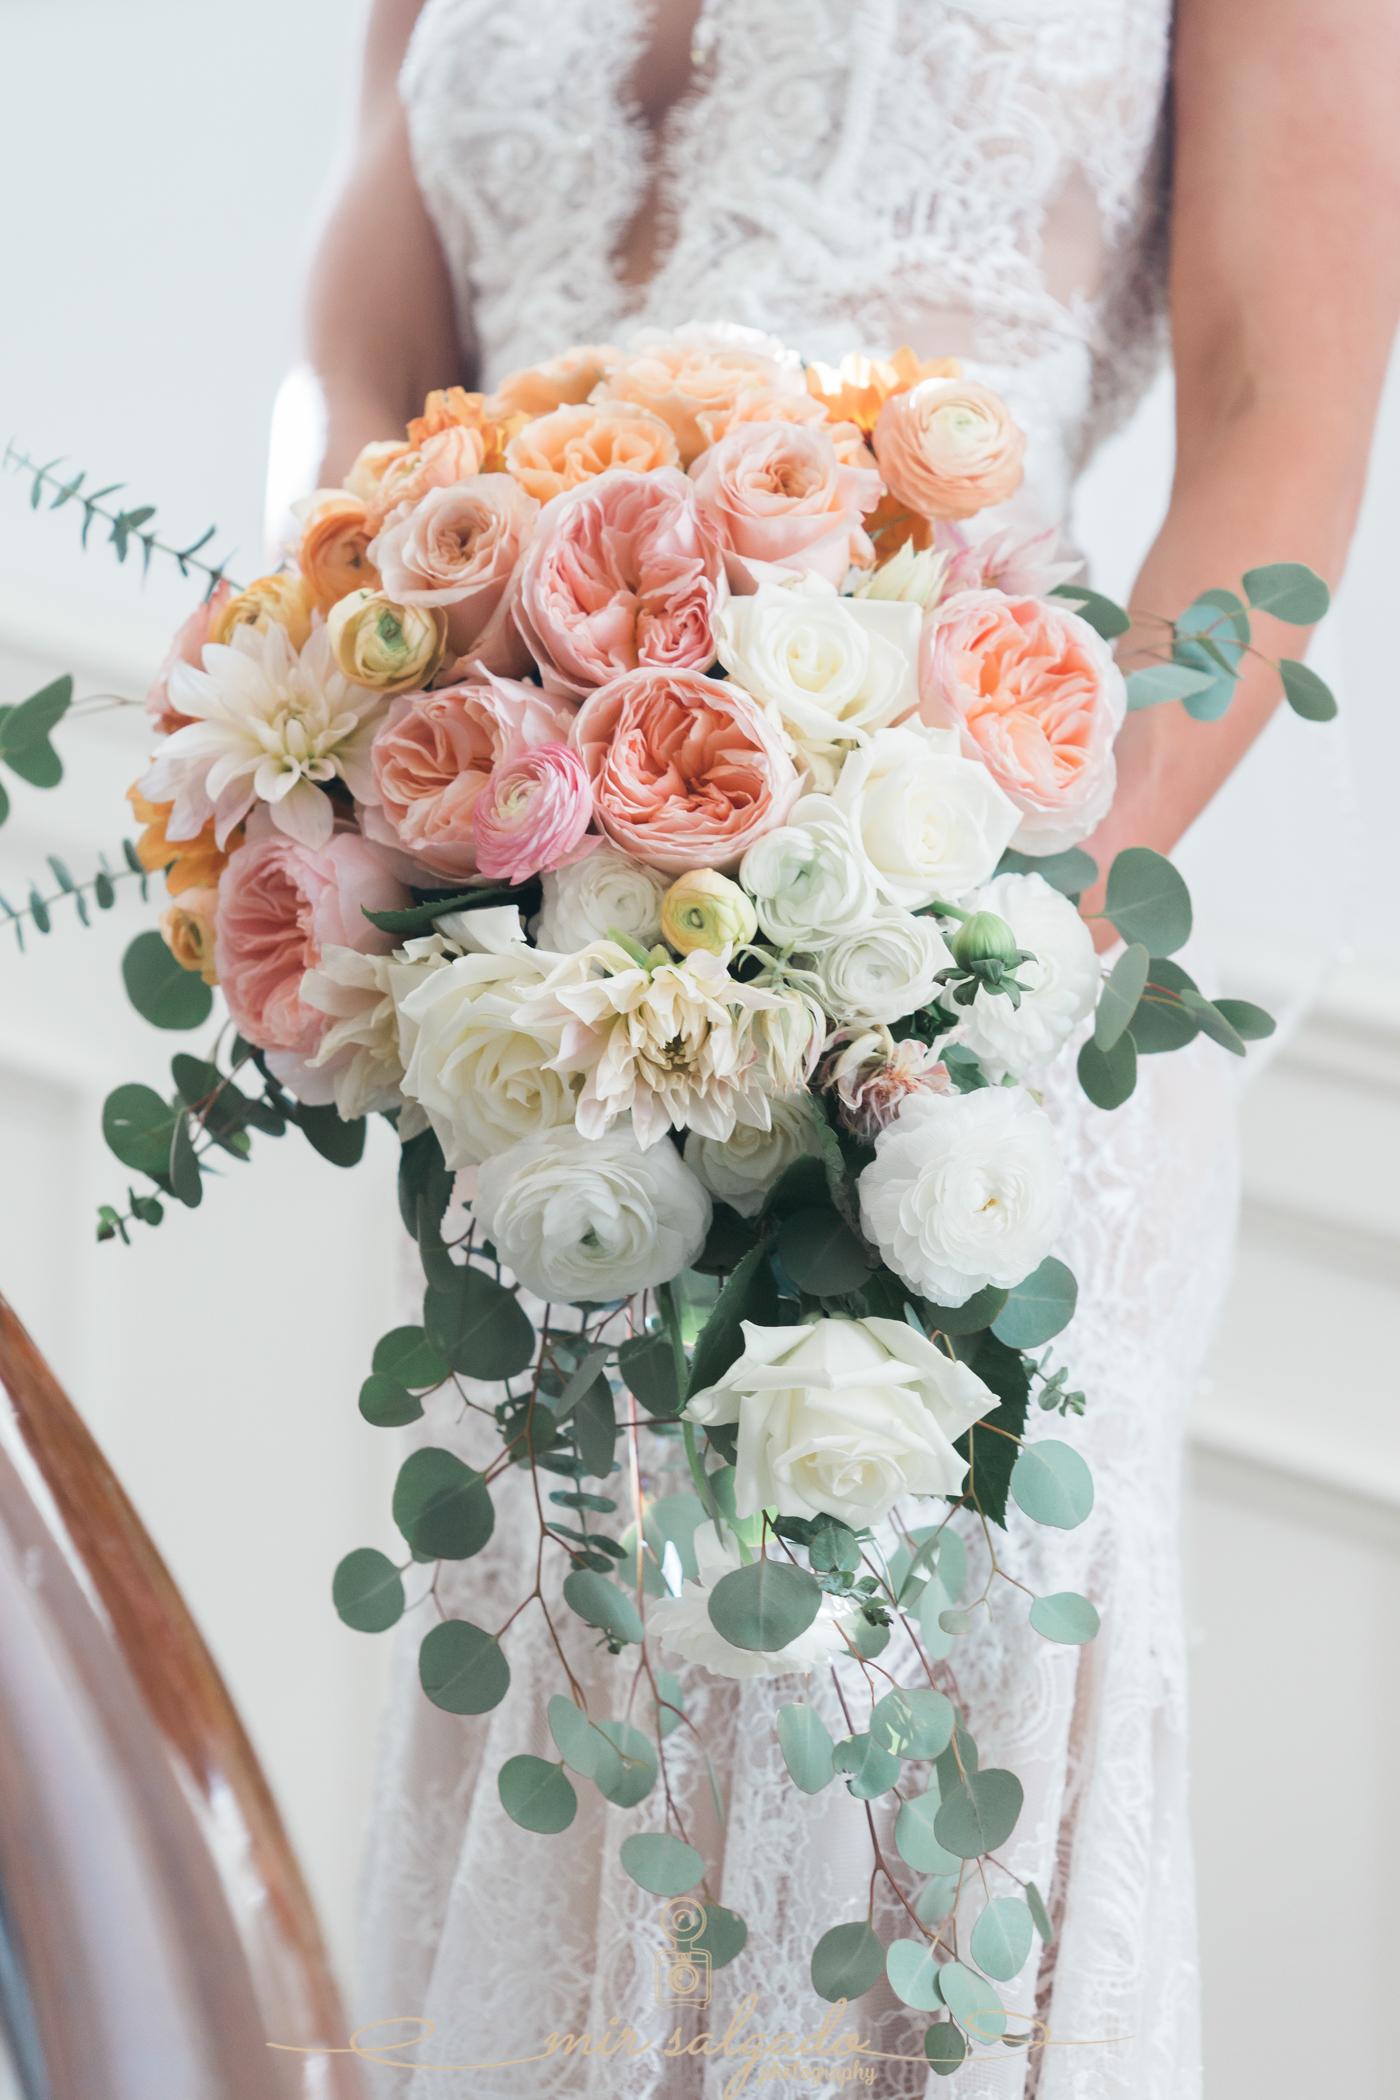 Tampa-bouquet-wedding, wedding-bouquet, Tampa-florist